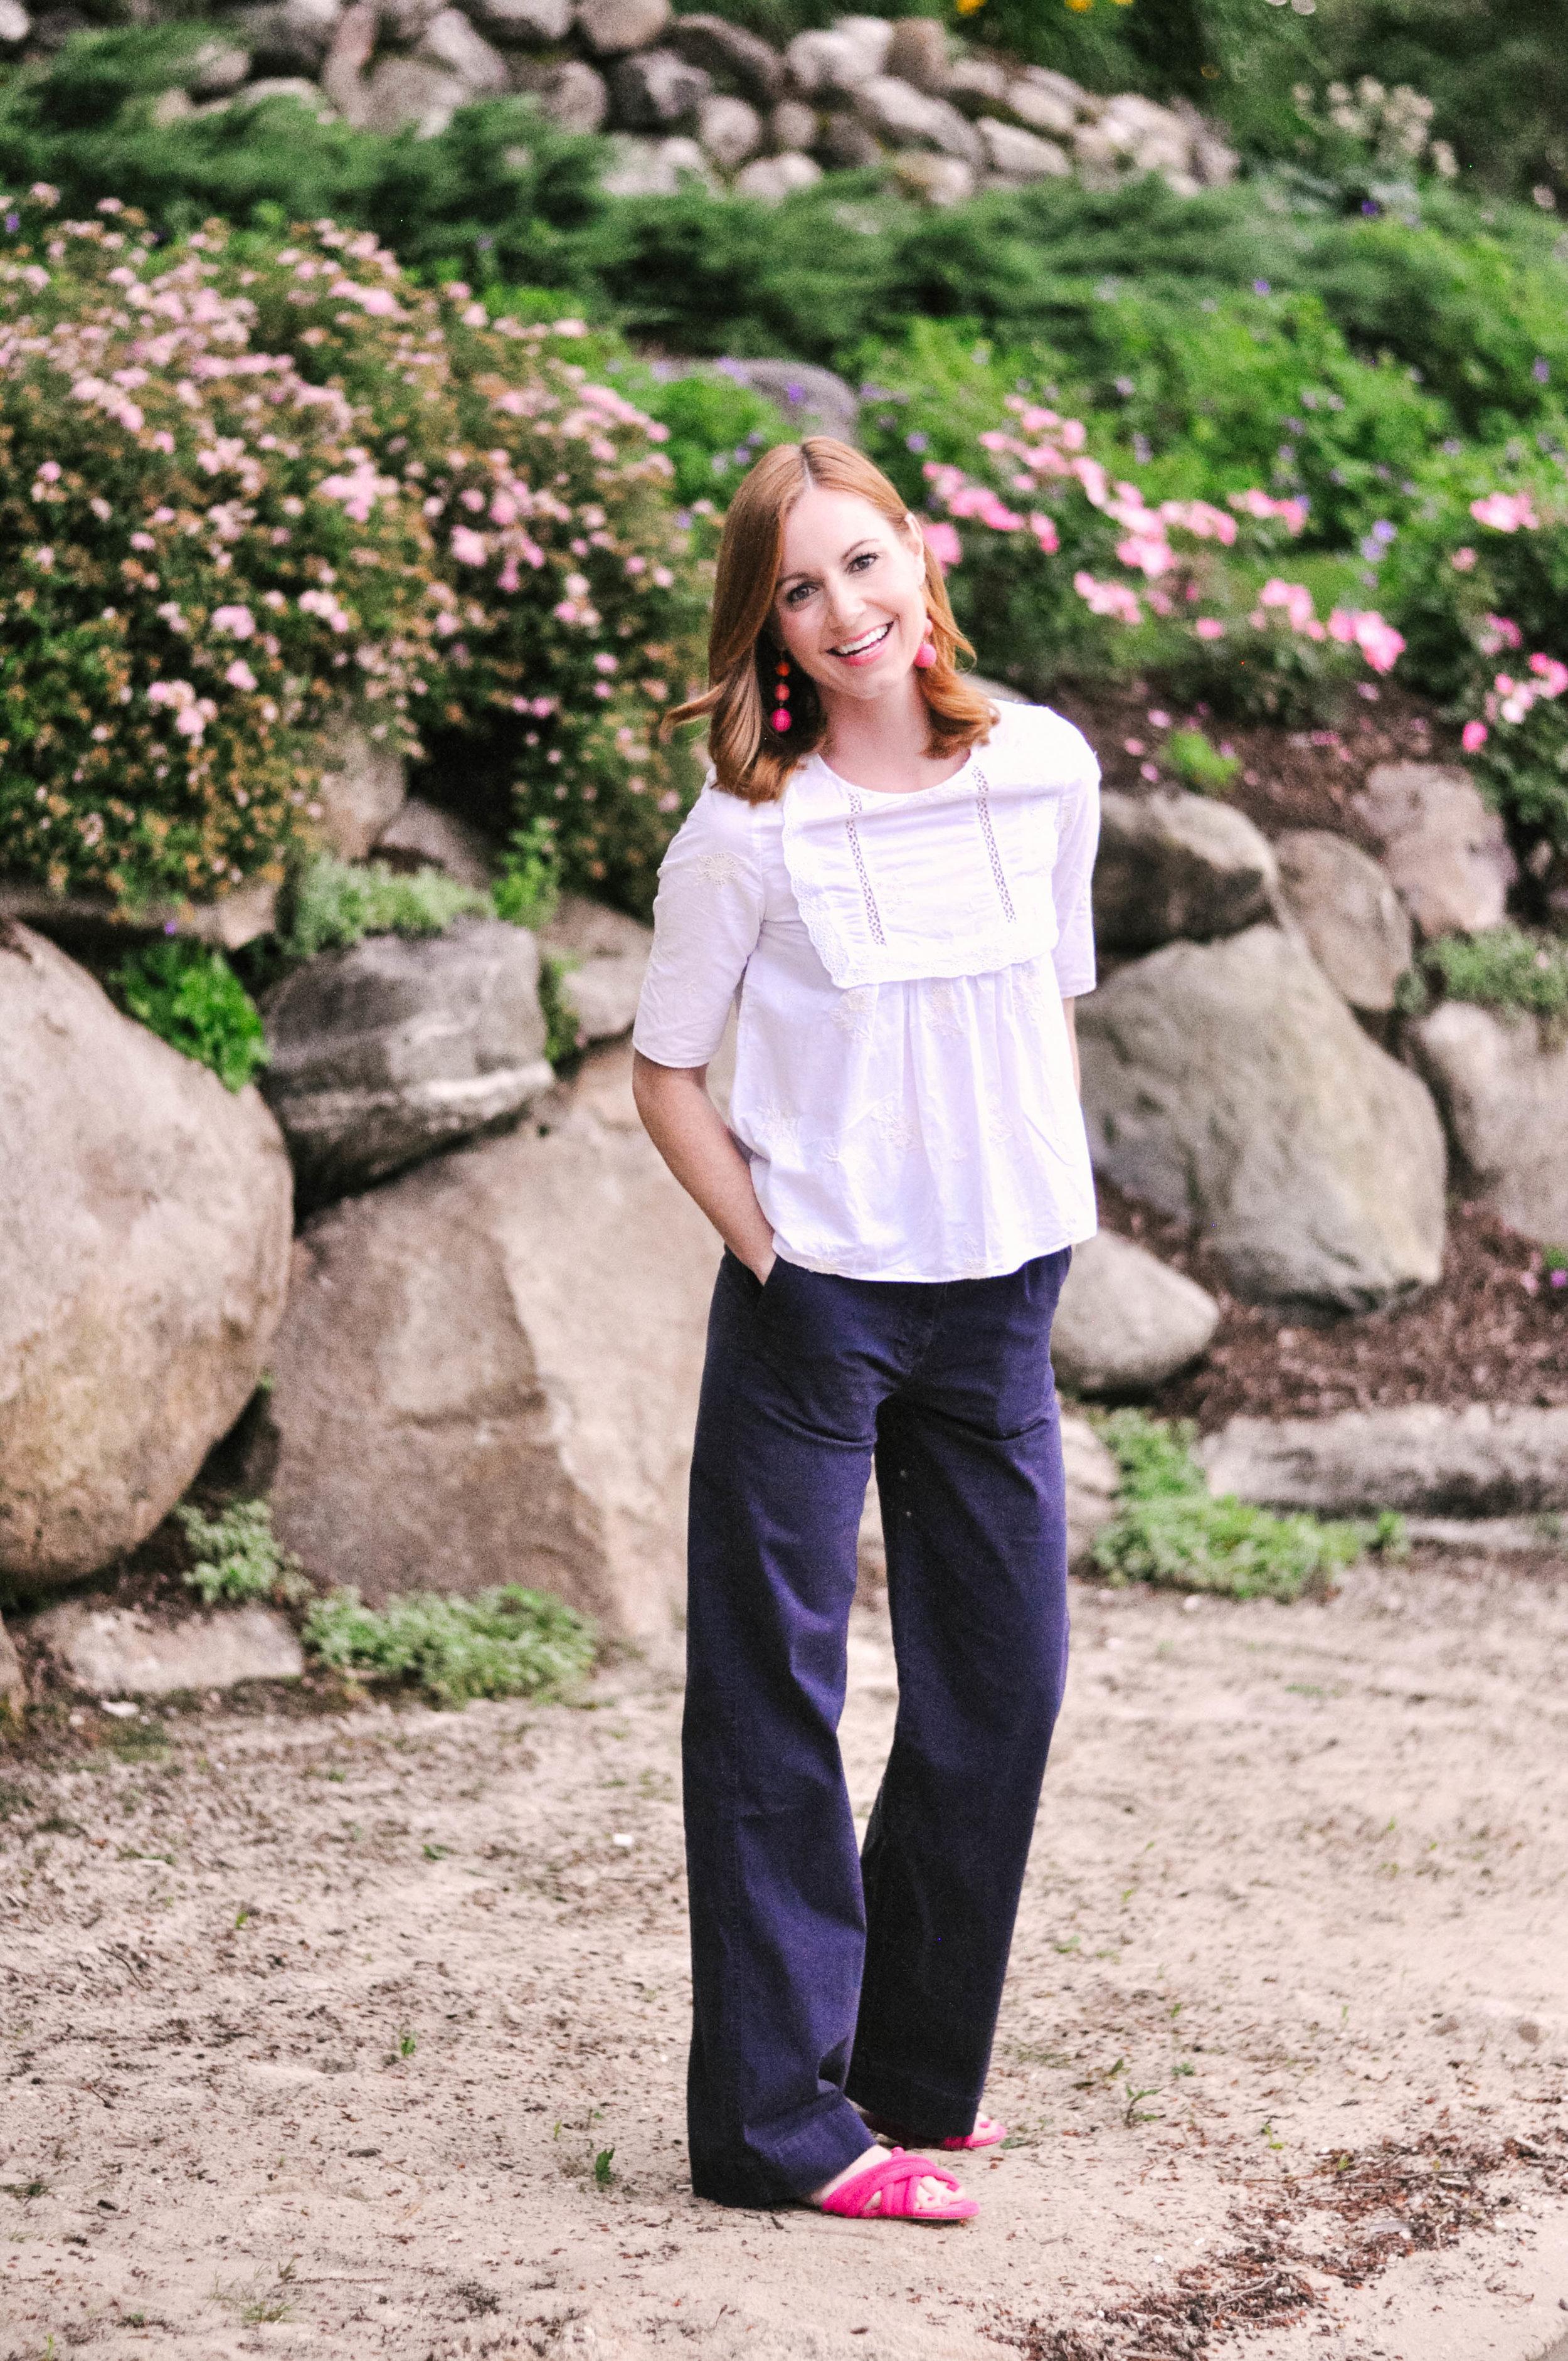 Summer Outfit: Zara Top, J.Crew Pants